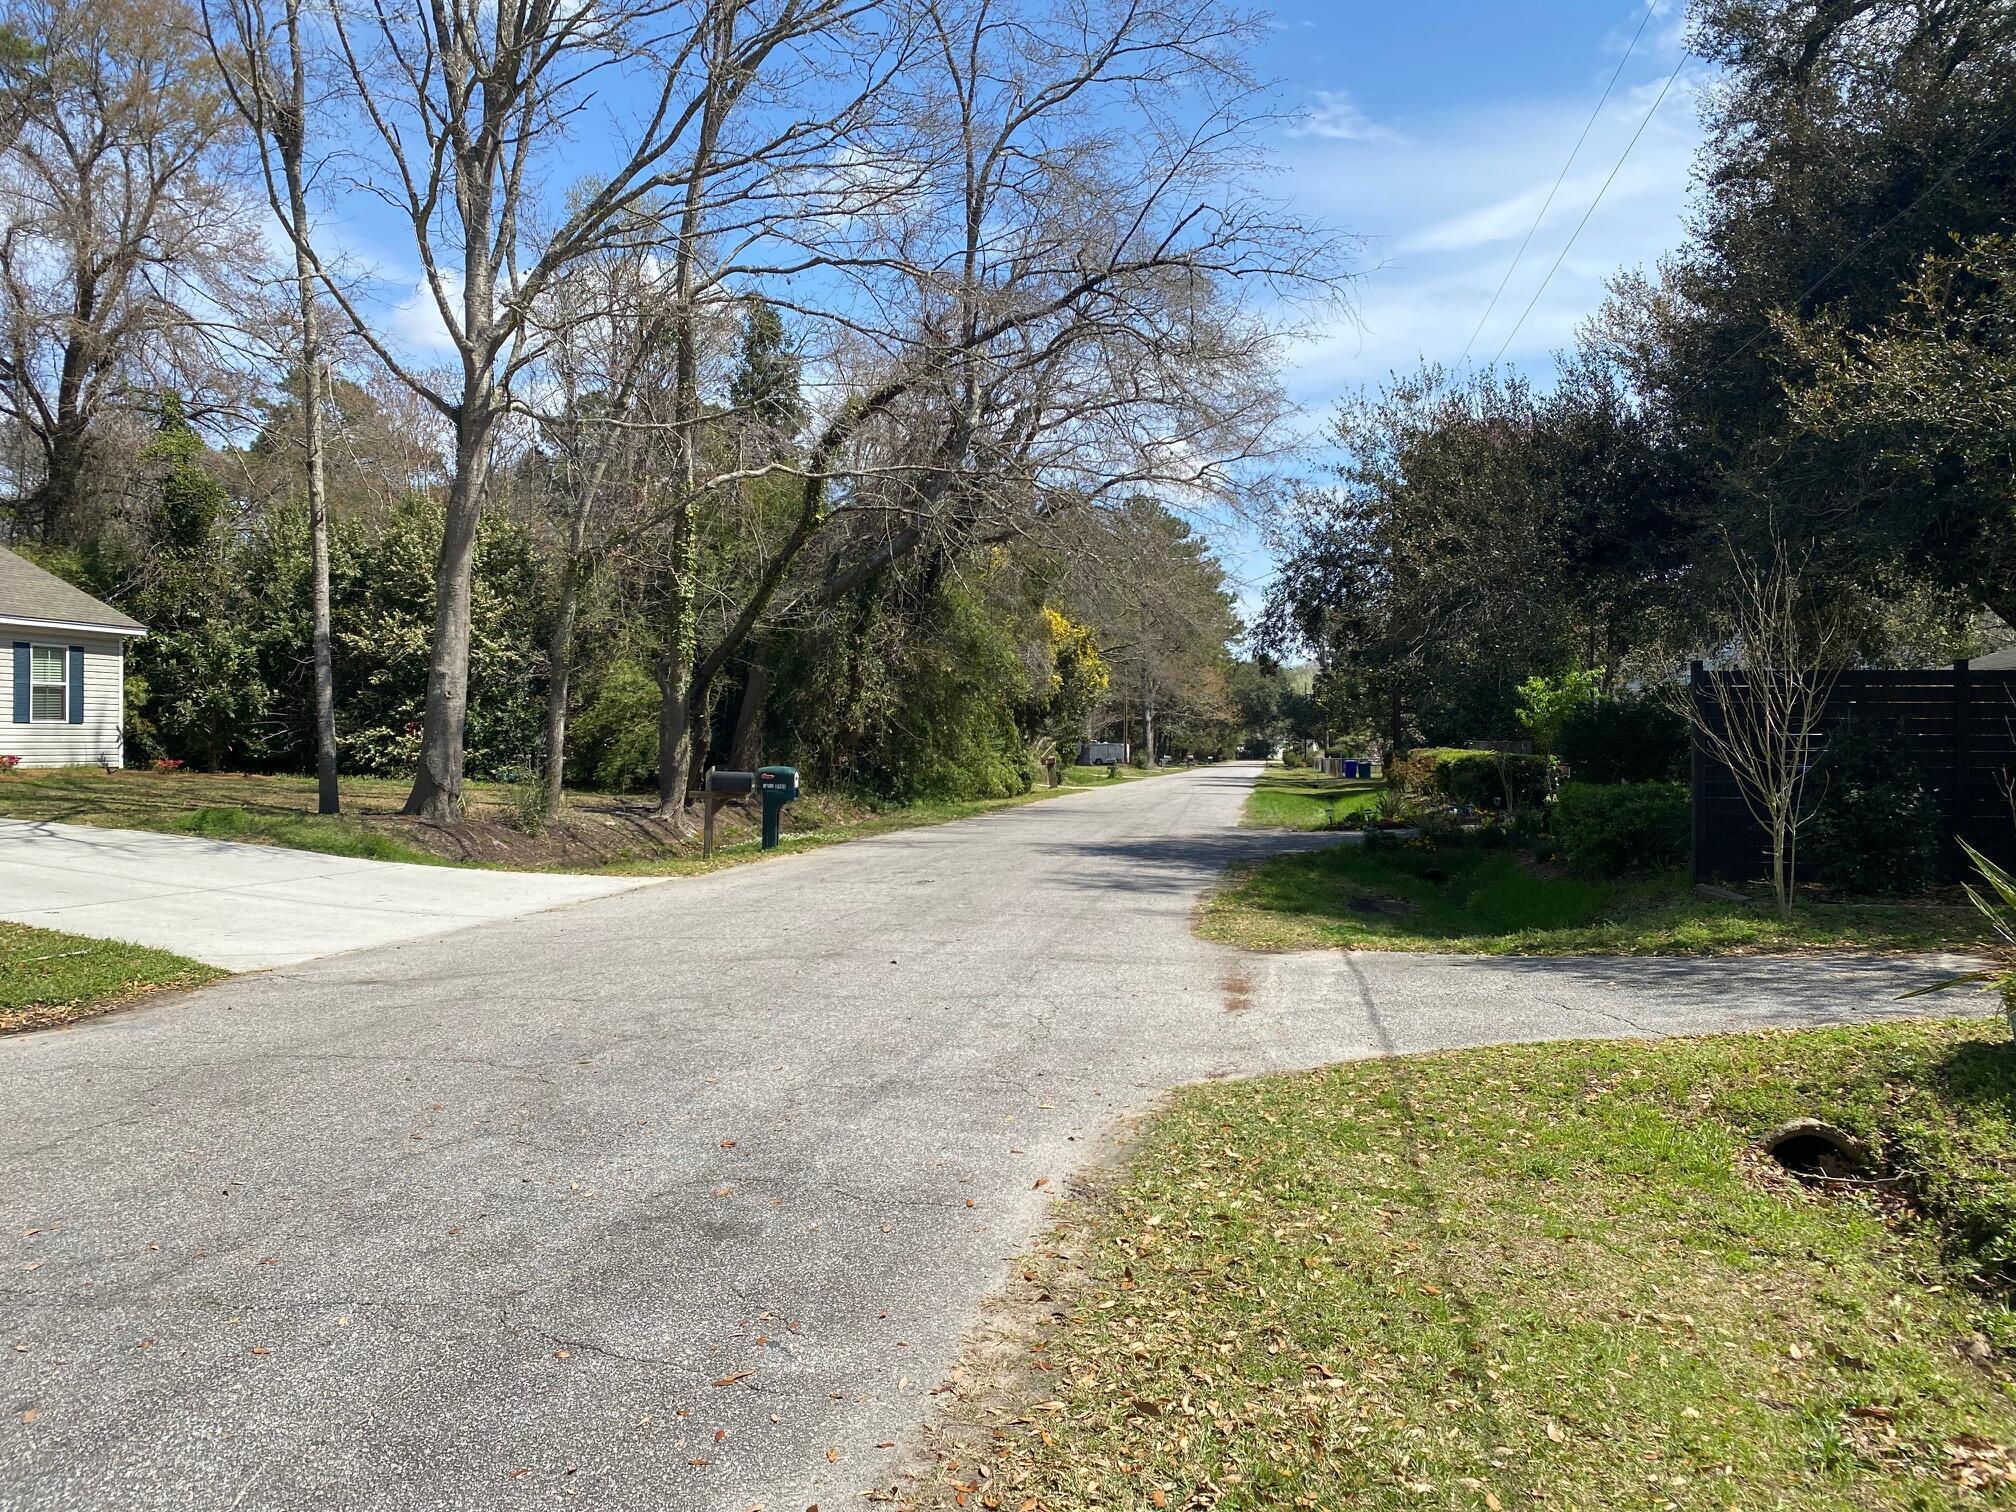 Stafford Heights Homes For Sale - 3472 Cynthia, Johns Island, SC - 18